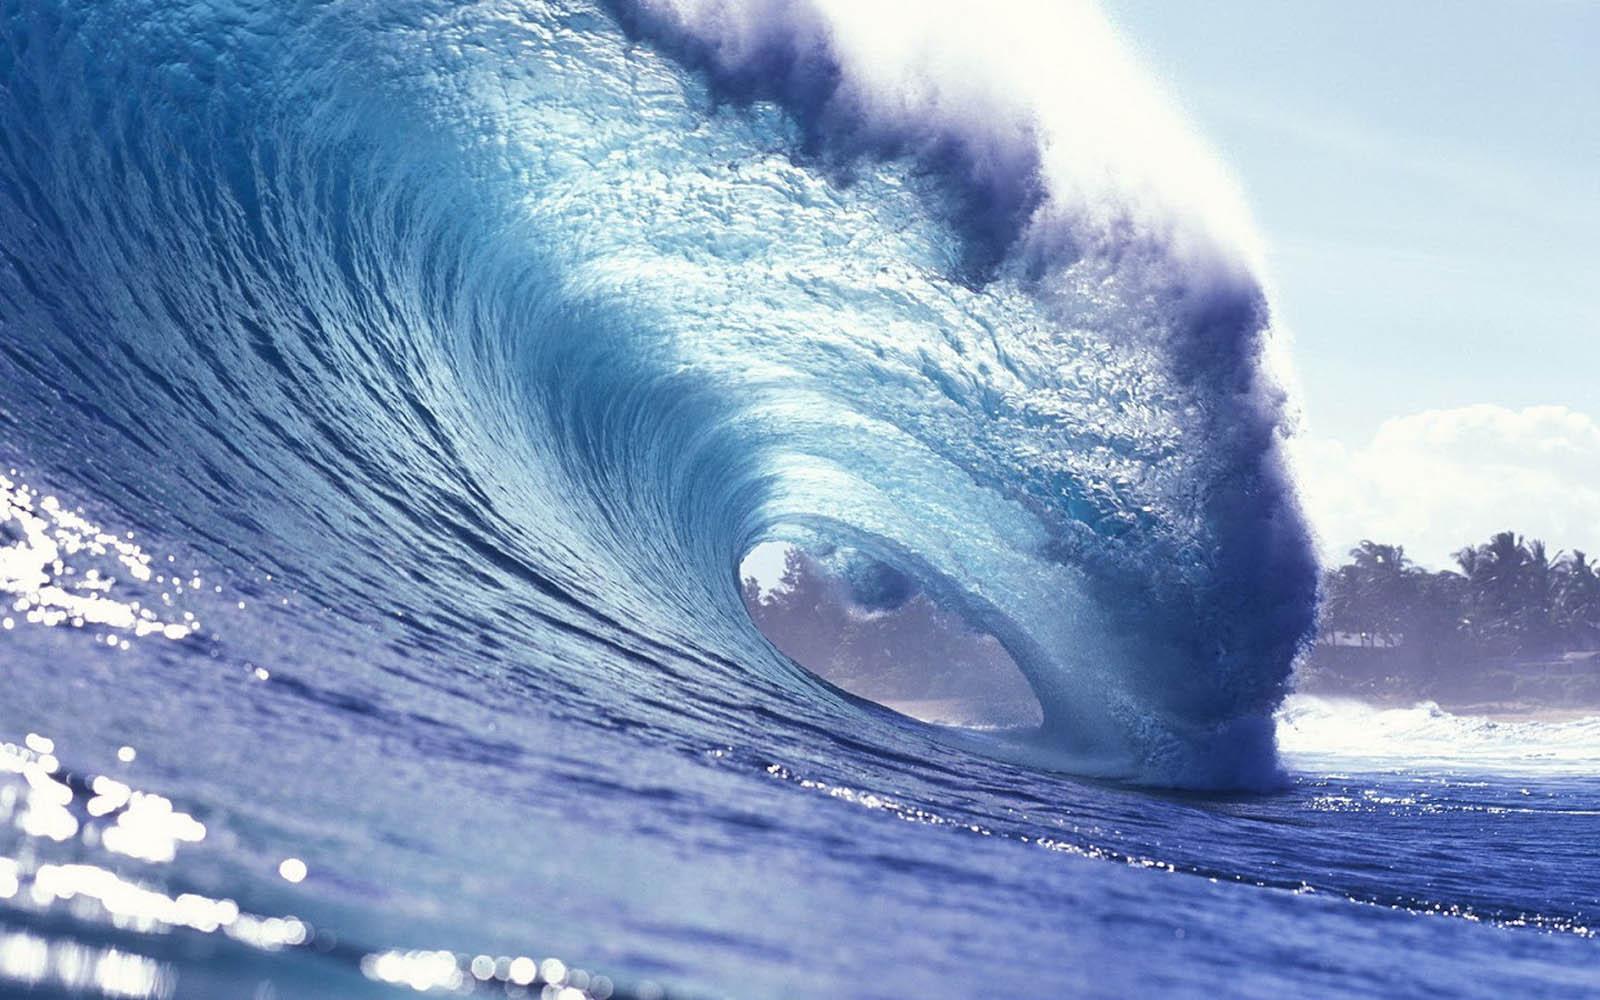 Big Wave Wallpapers Wallpaper 1600x1000